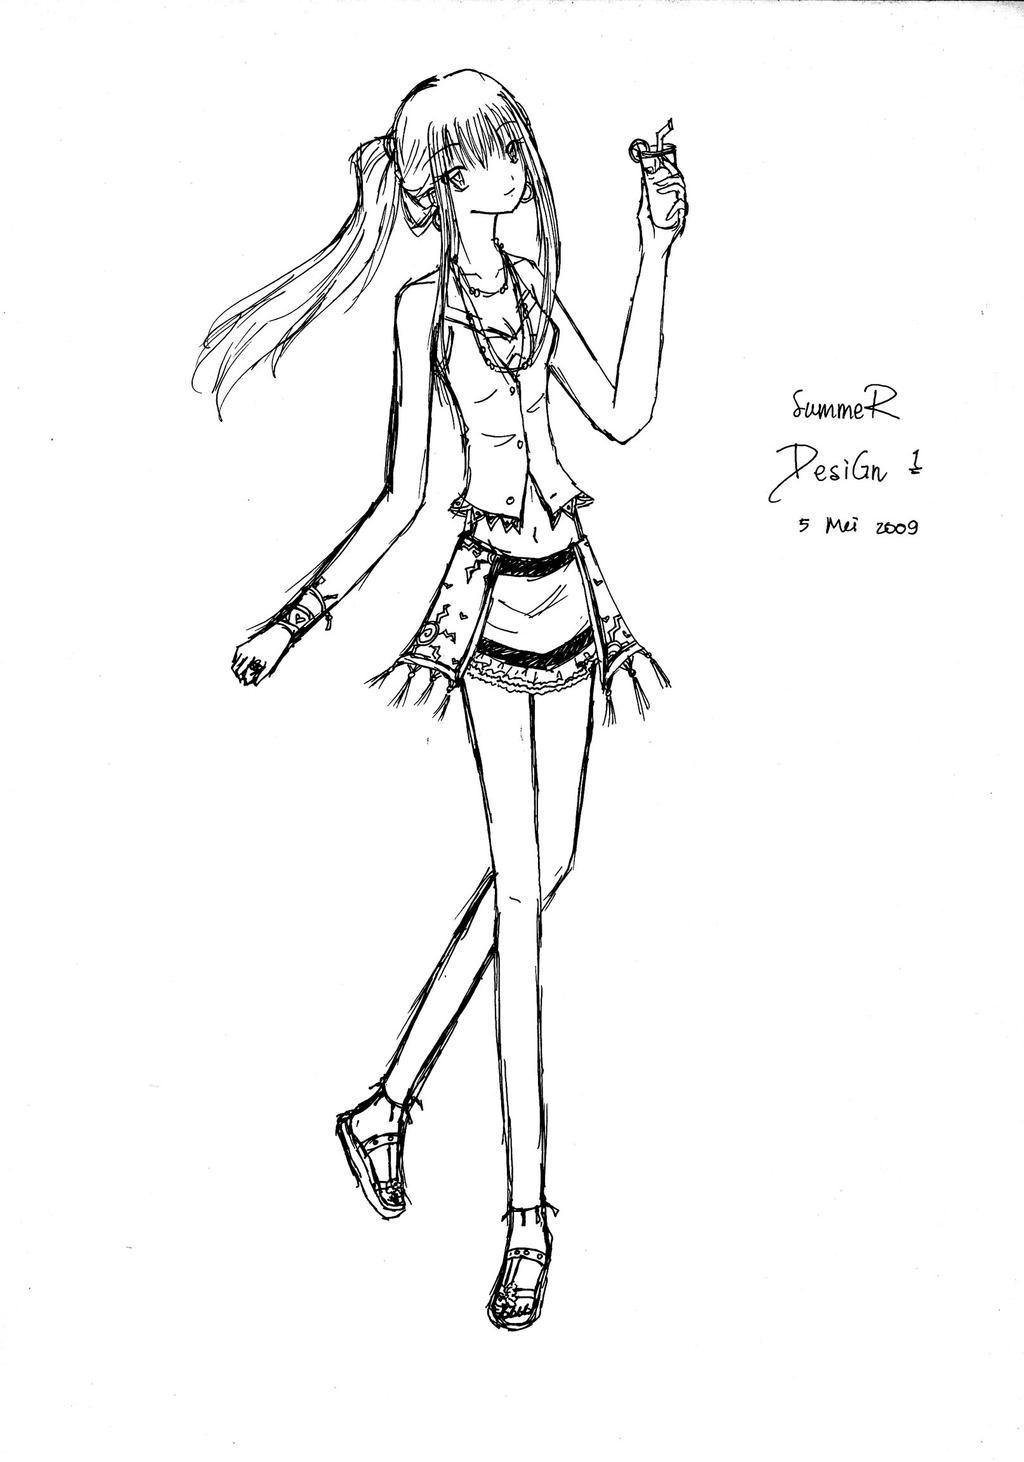 Summer design 1 by Vivian16